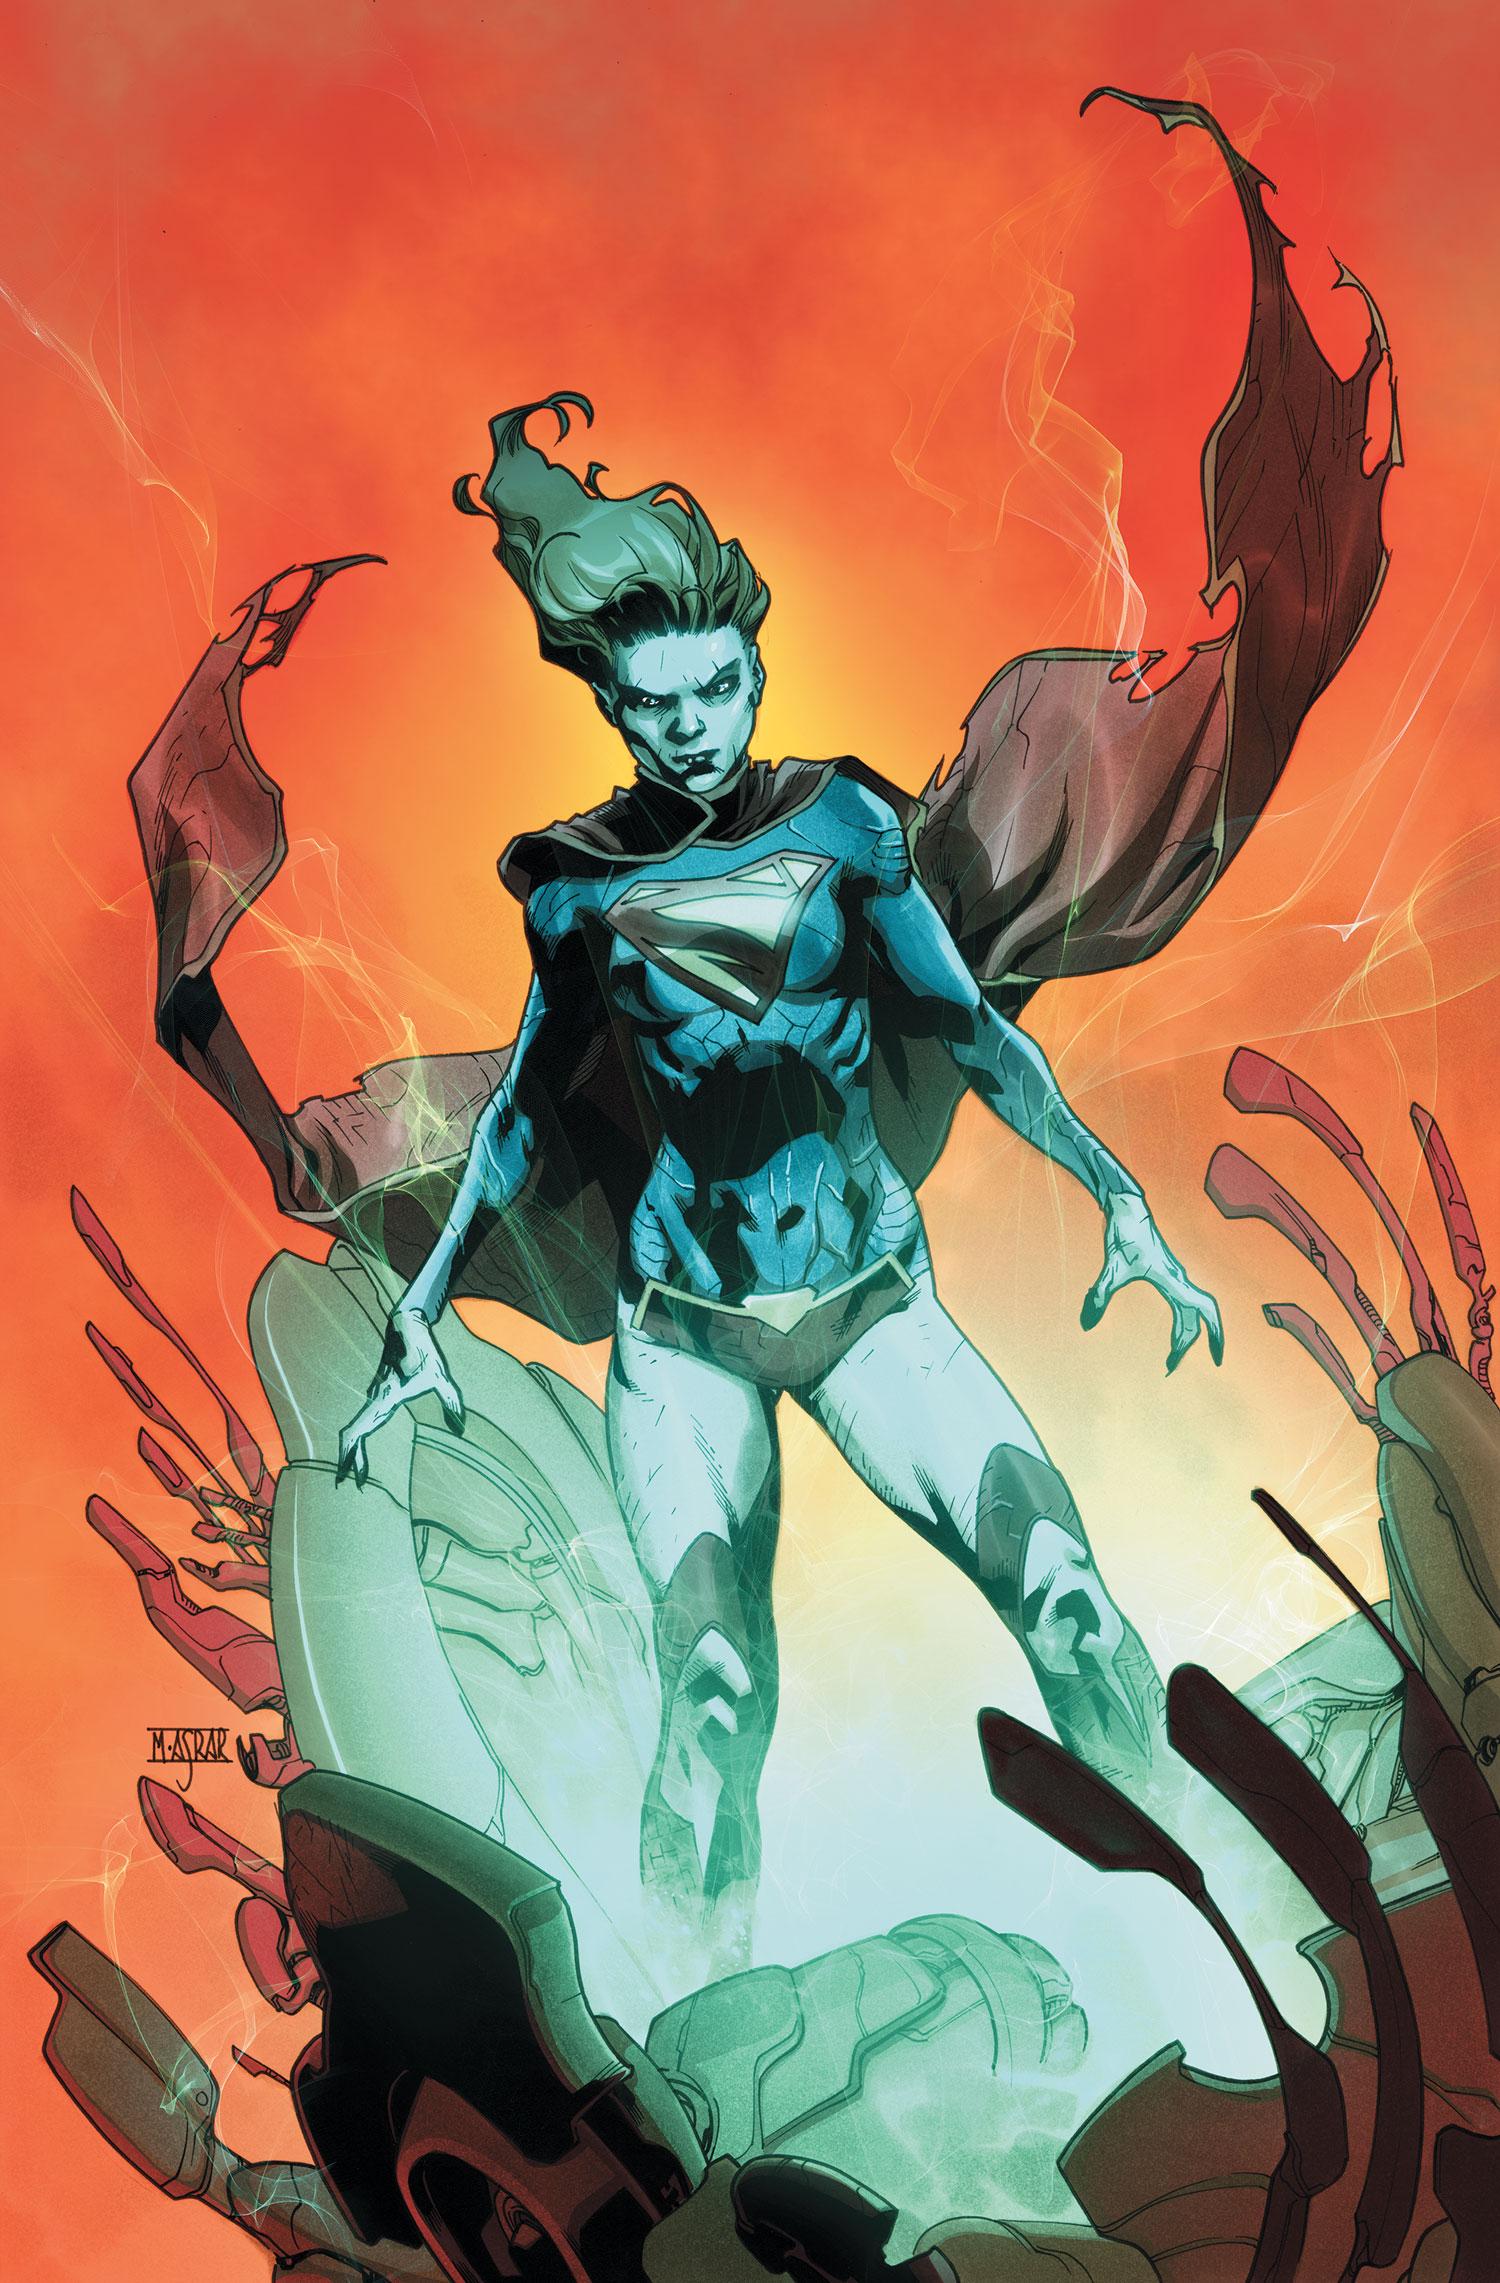 Supergirl Vol 6 18 Alt Colour Textless.jpg